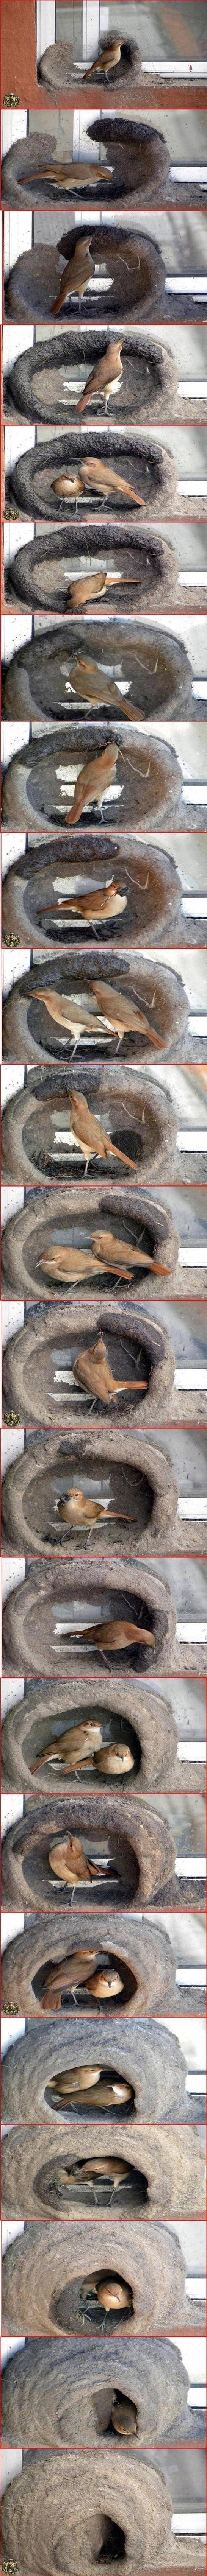 red oven birds building nest. . godhatestags